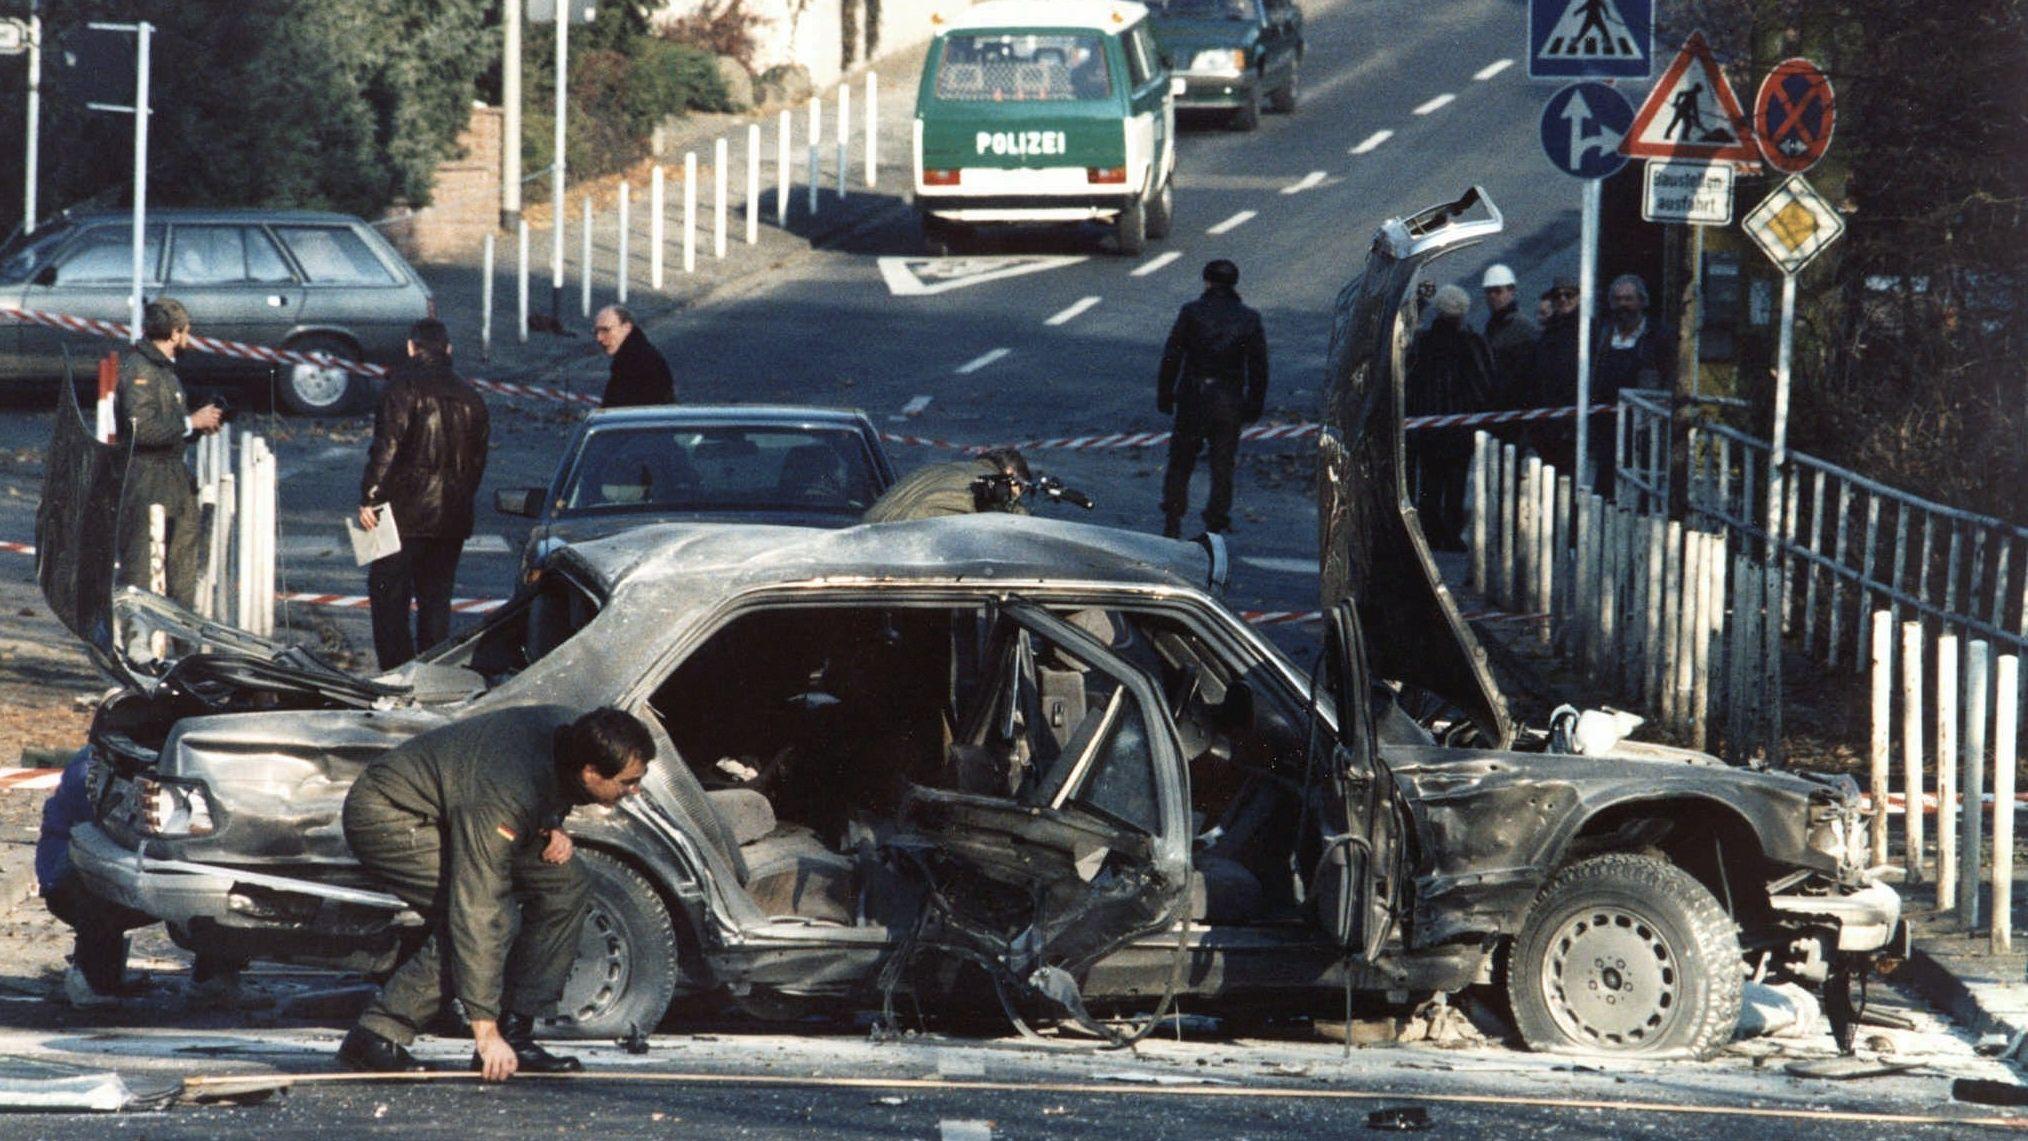 Polizisten am 30. November 1989 am Schauplatz des Attentats.